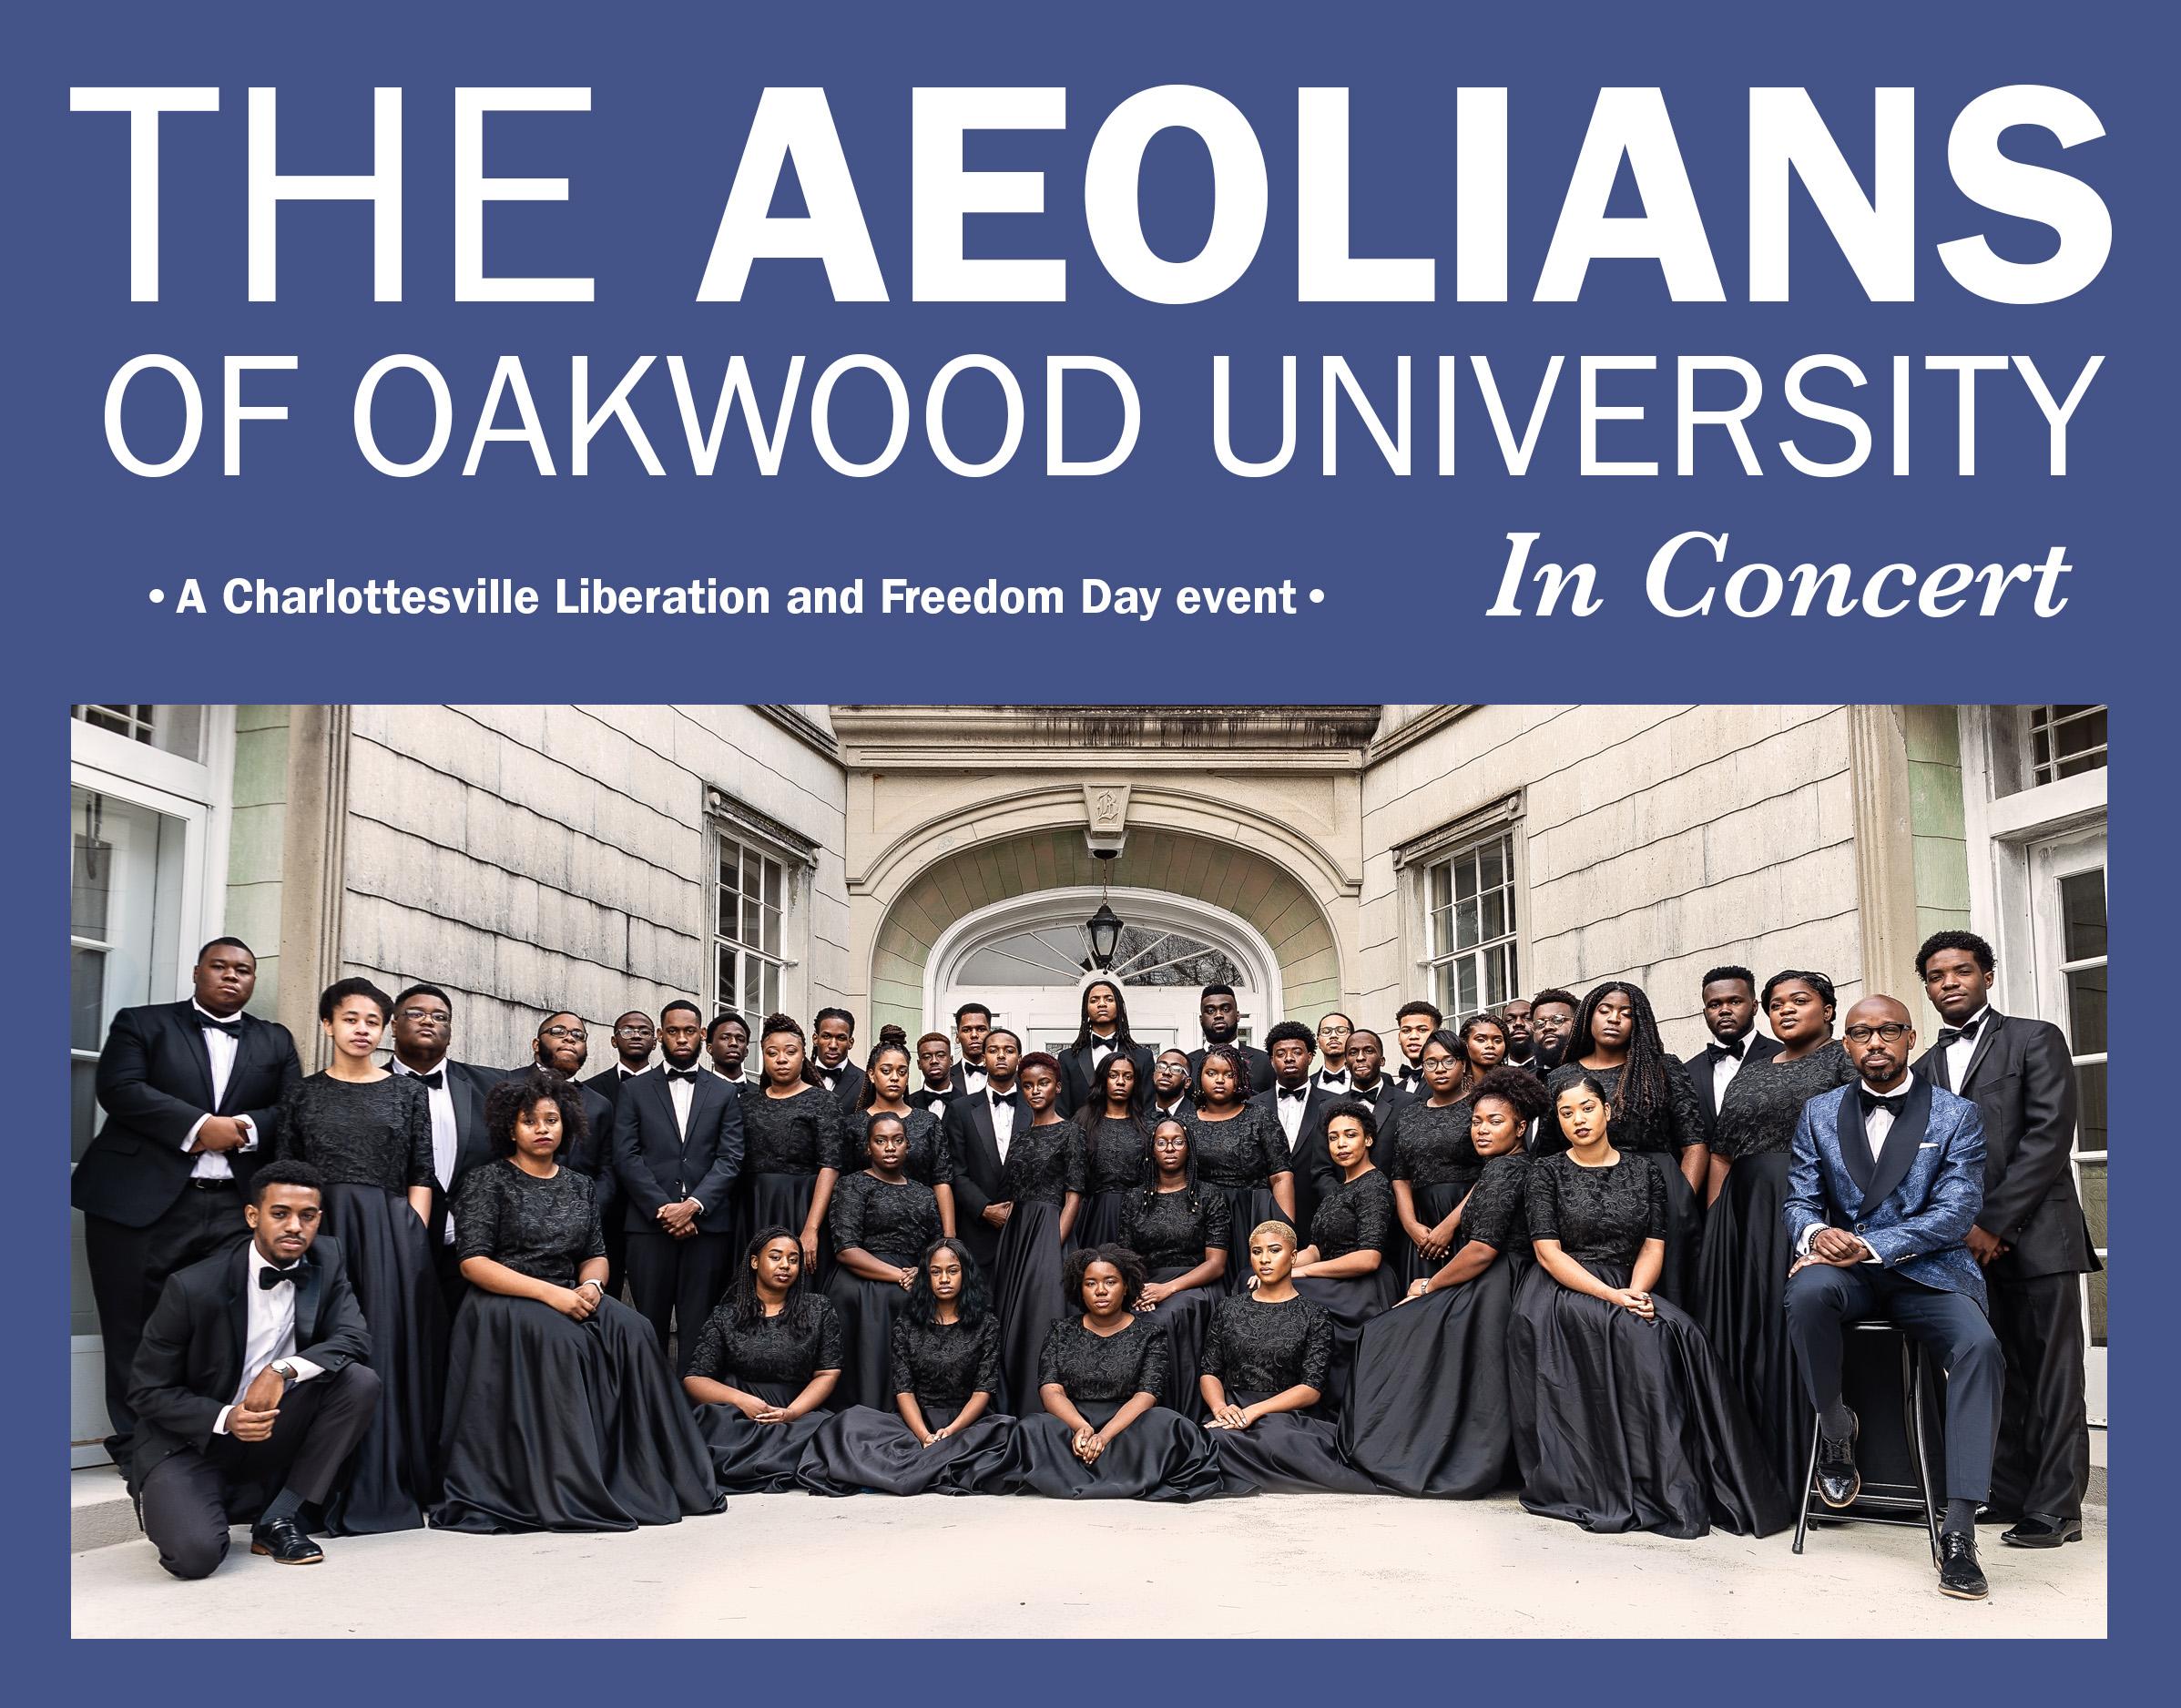 The Aeolians of Oakwood University group portrait.